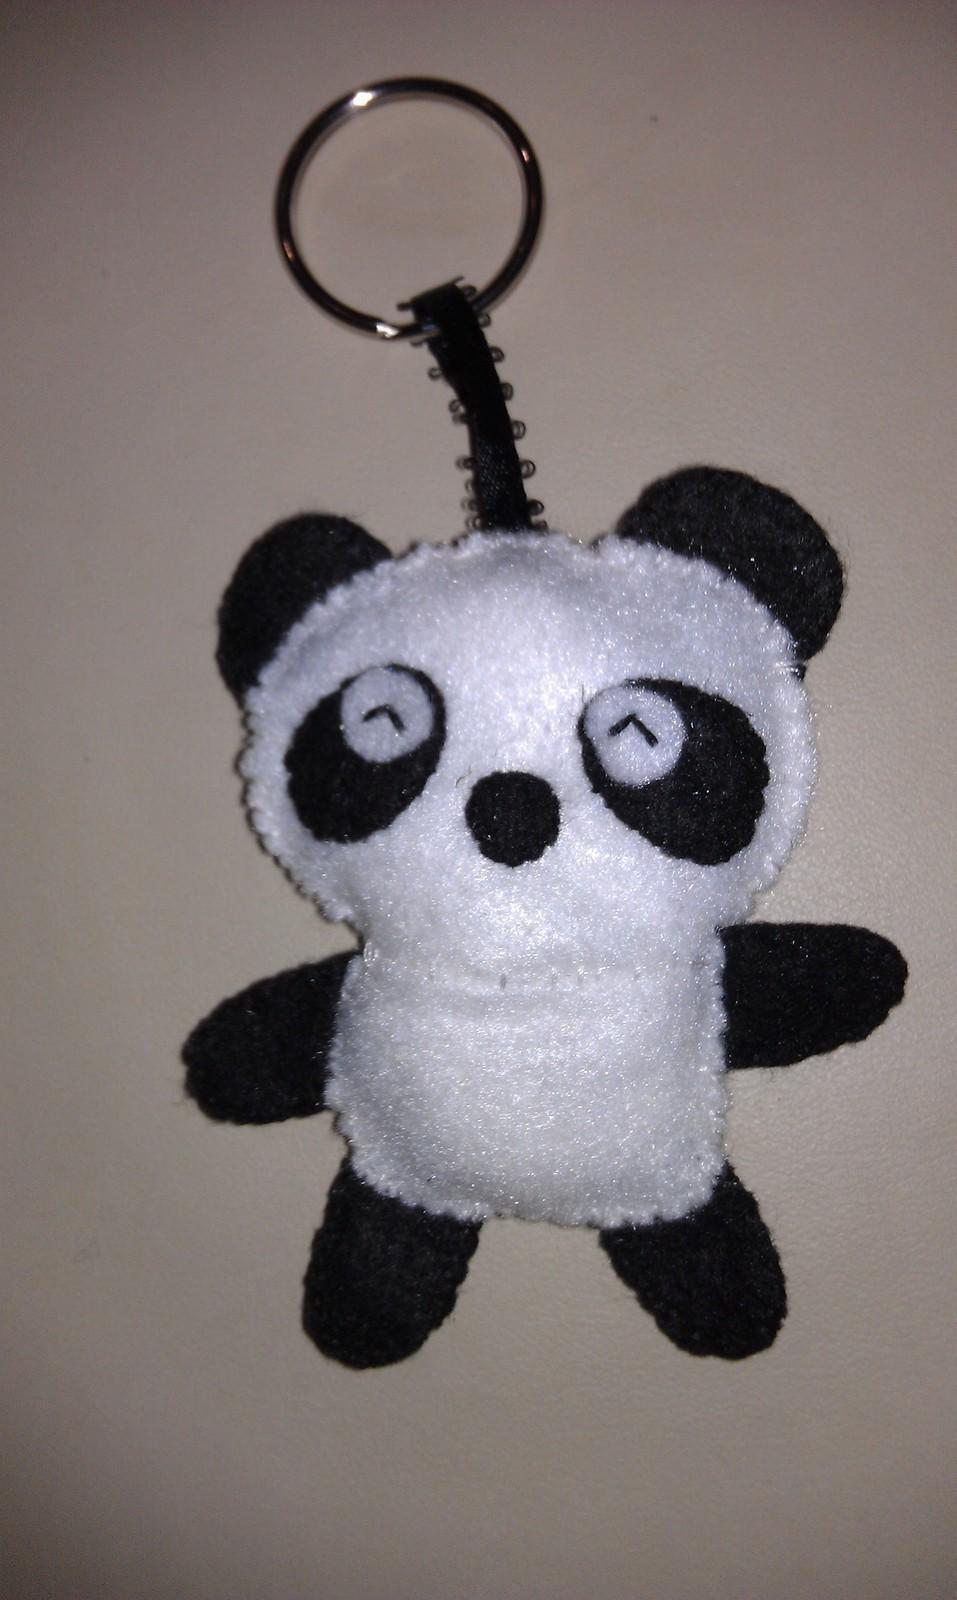 Felt Panda Key Chain A Fabric Animal Charm Sewing On